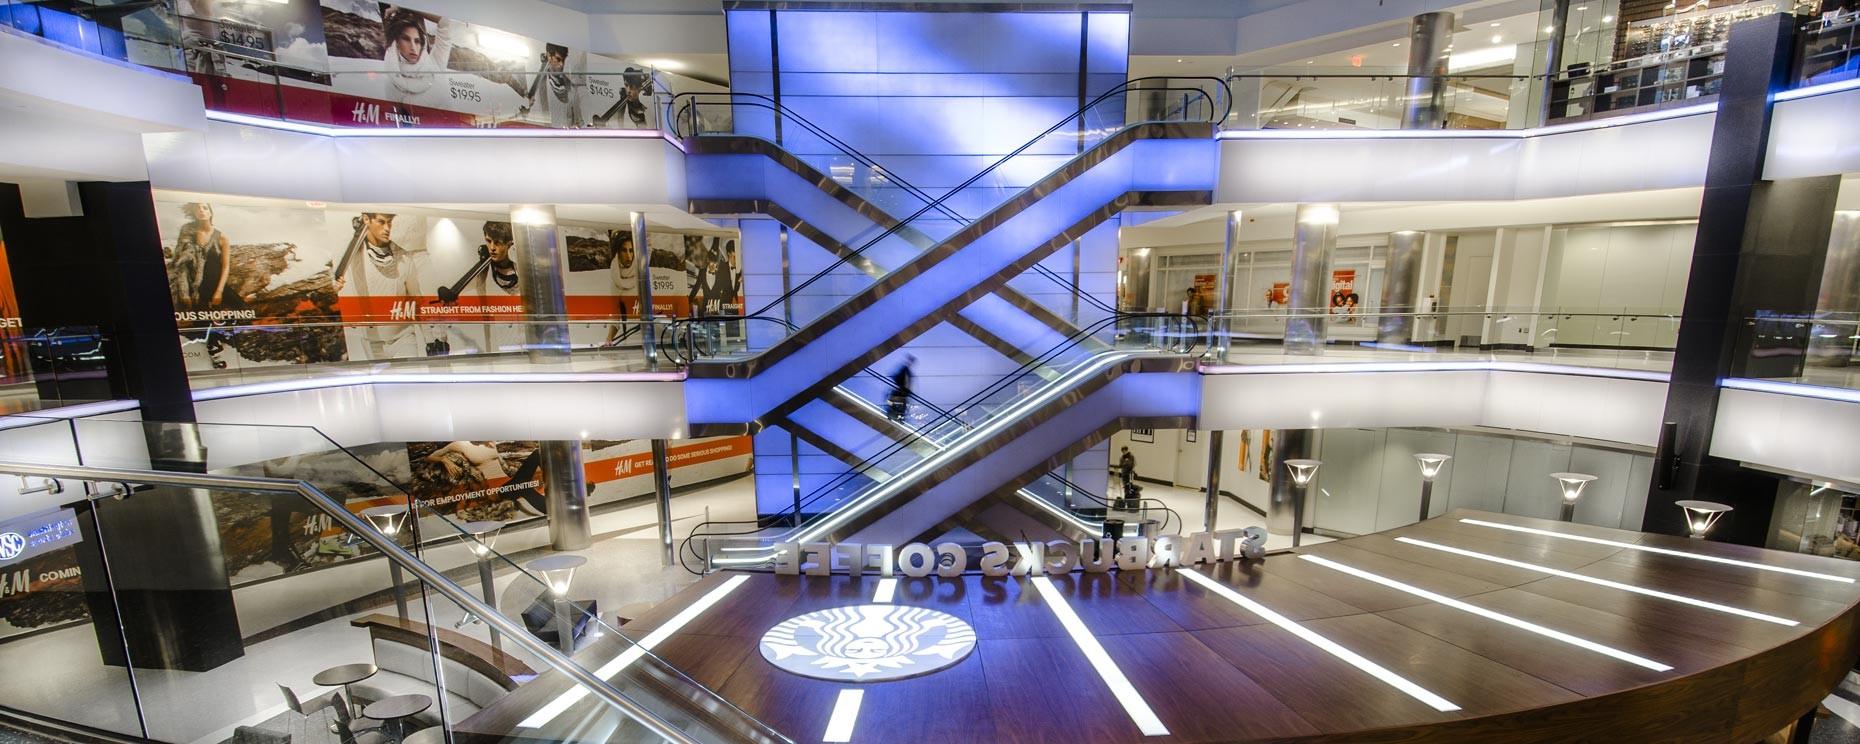 Translucent resin light walls, escalators, stair risers, Starbucks ® Coffee kiosk and public seating areas